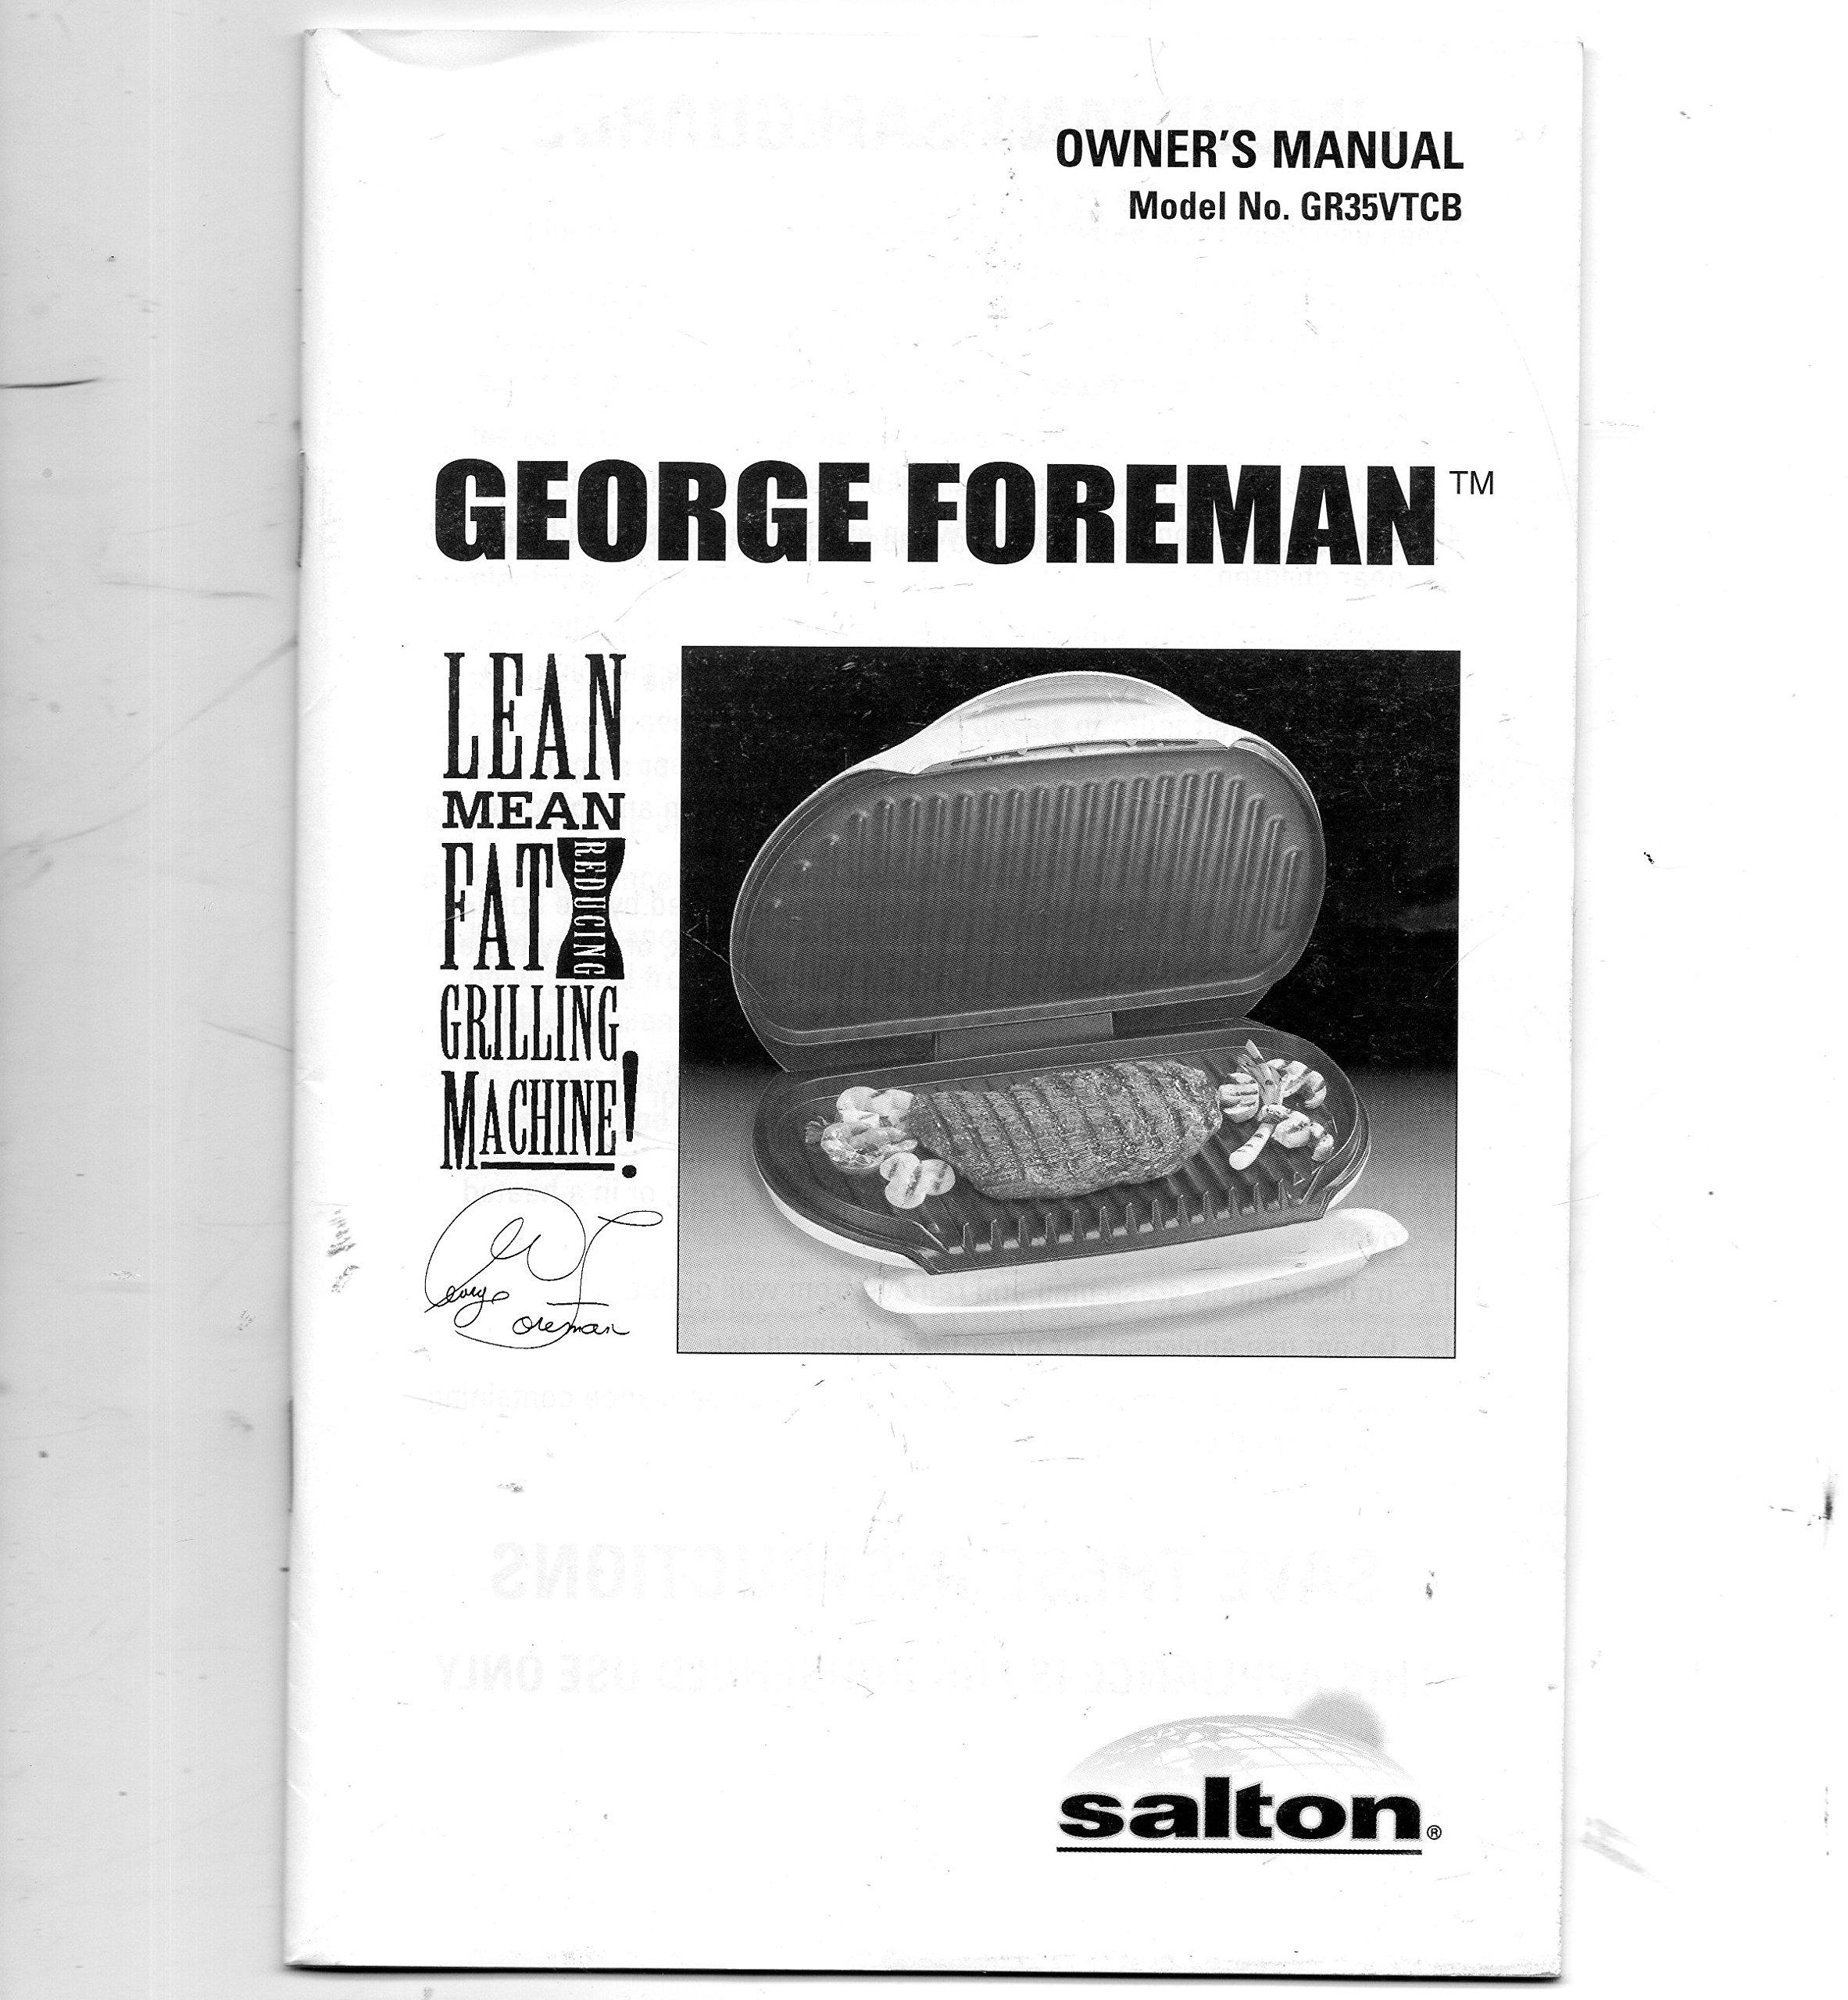 Owner's Manual Model No. GR35VTCB George Foreman, Lean, Mean, Fat Grilling  Machine: Salton, George Foreman: Amazon.com: Books